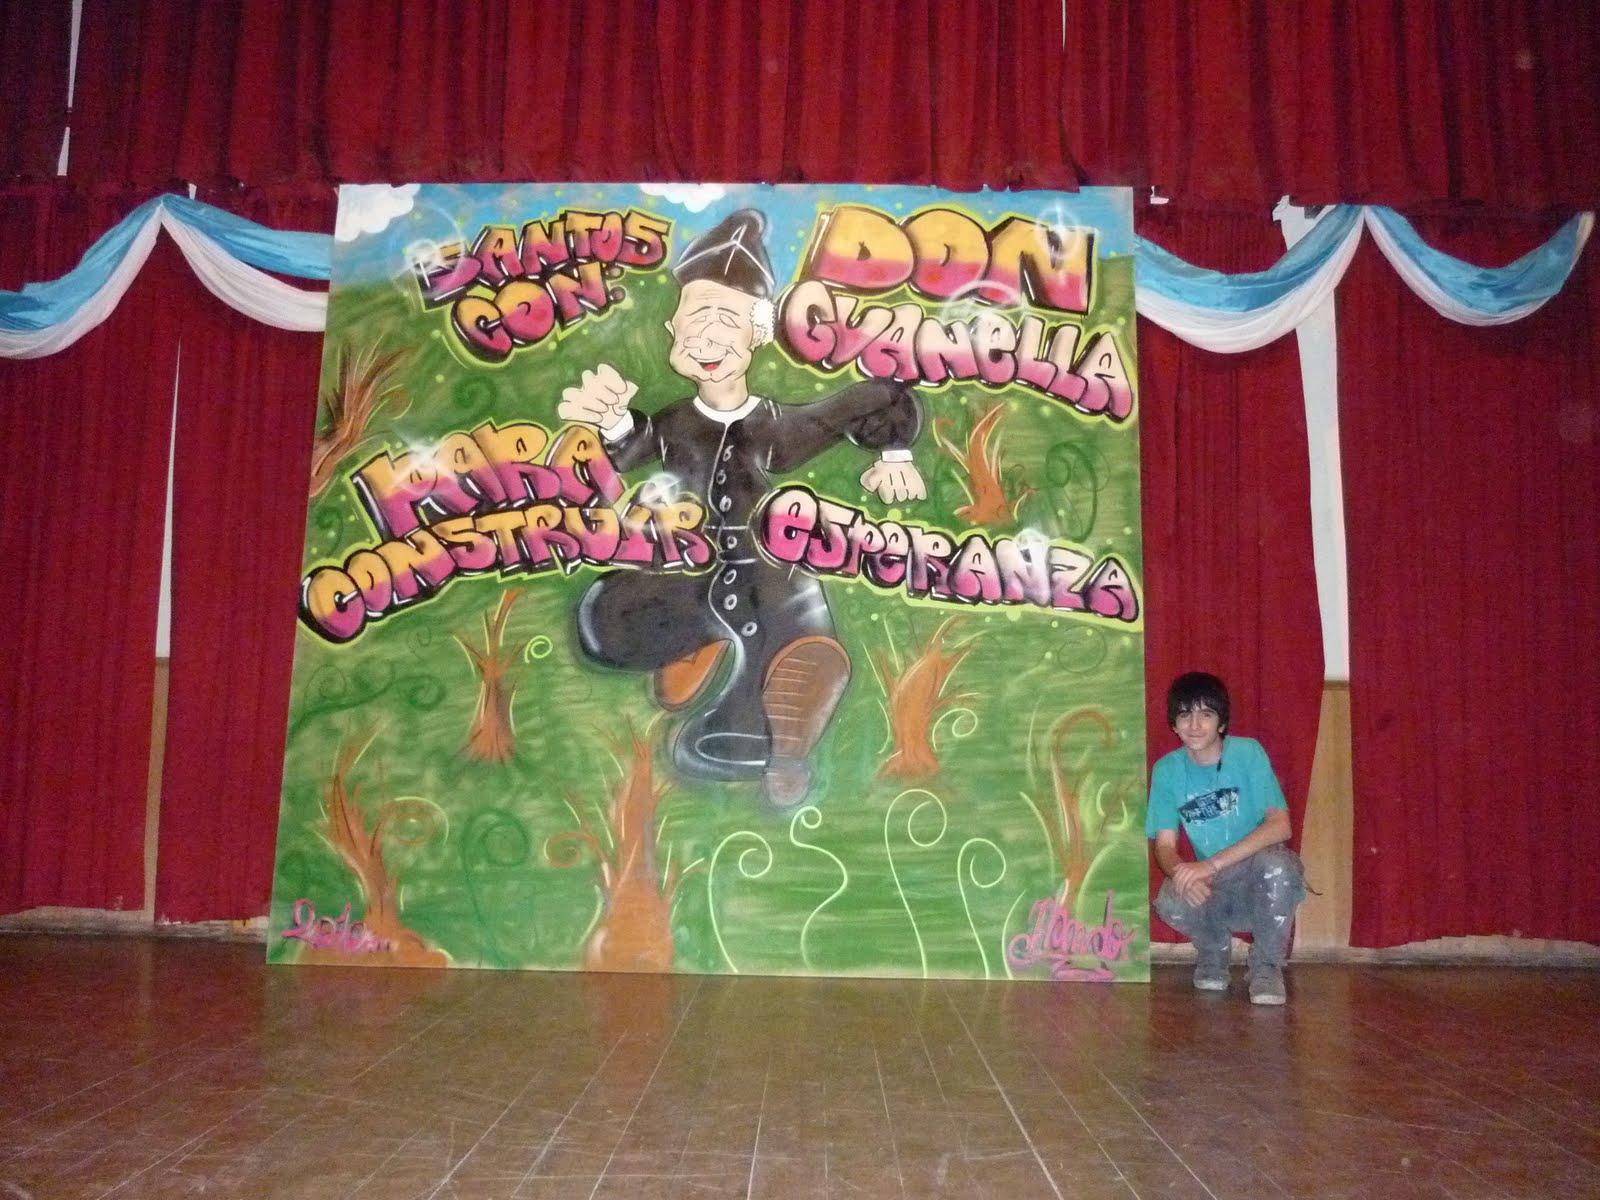 Pastoral juvenil y vocacional guanelliana argentina for El mural pelicula argentina